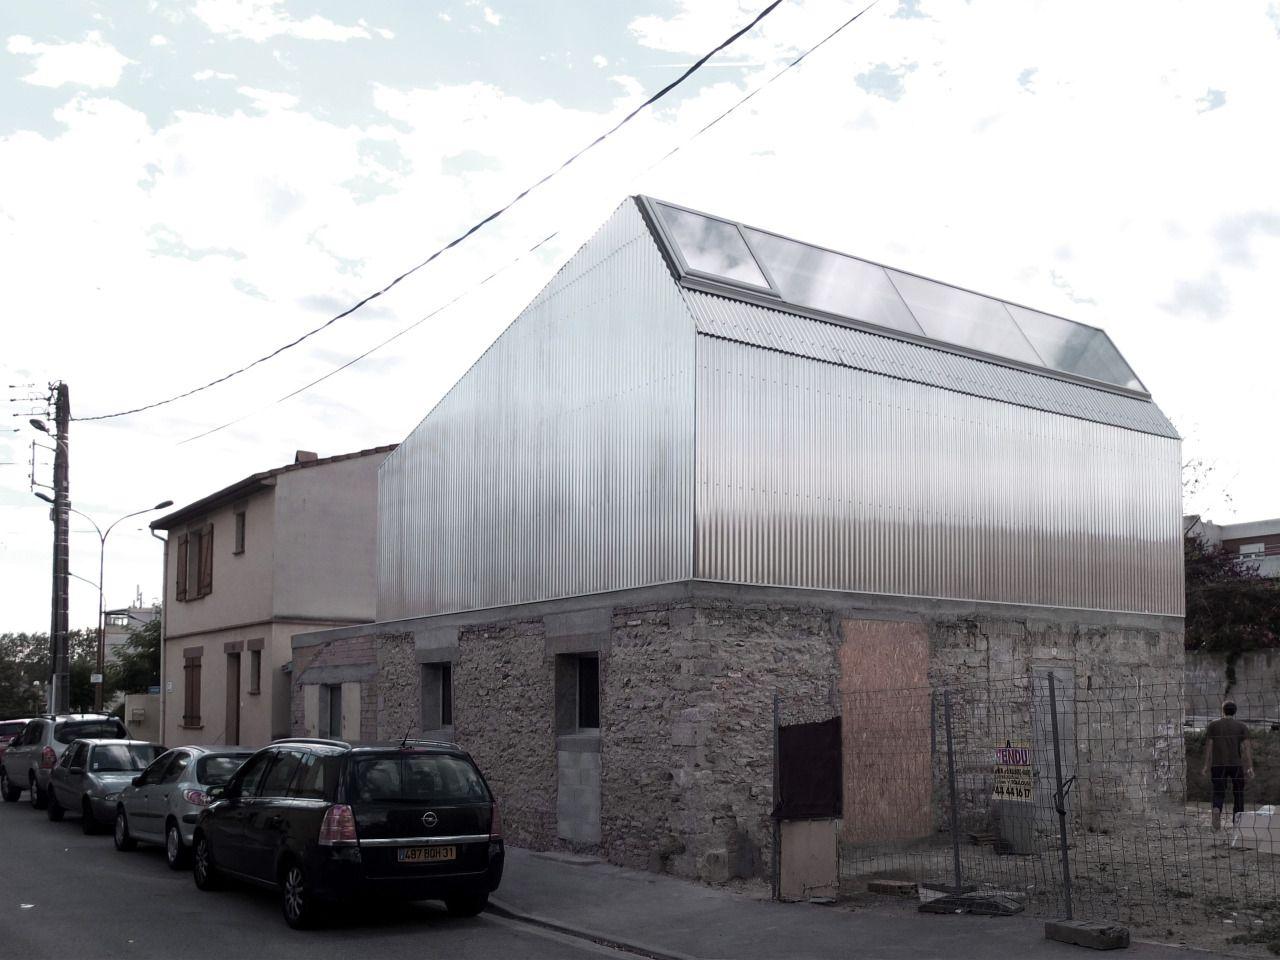 Bast - M03 house addition, Toulouse 2013. Photos © Bast. [[MORE]]